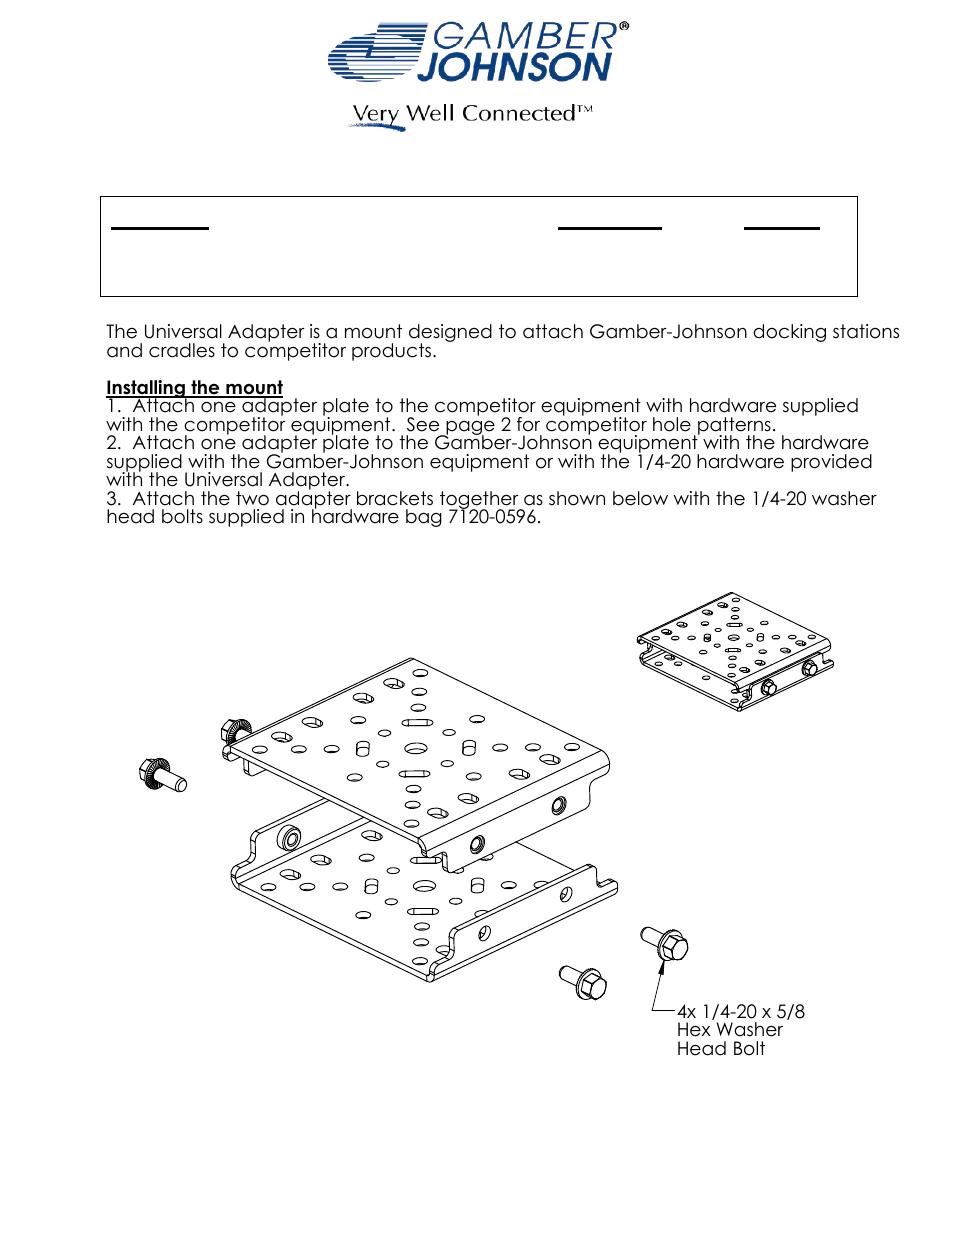 gamber johnson 7160 0454 user manual 2 pages rh manualsdir com Gamber-Johnson iPad Docking Station Gamber-Johnson Consoles